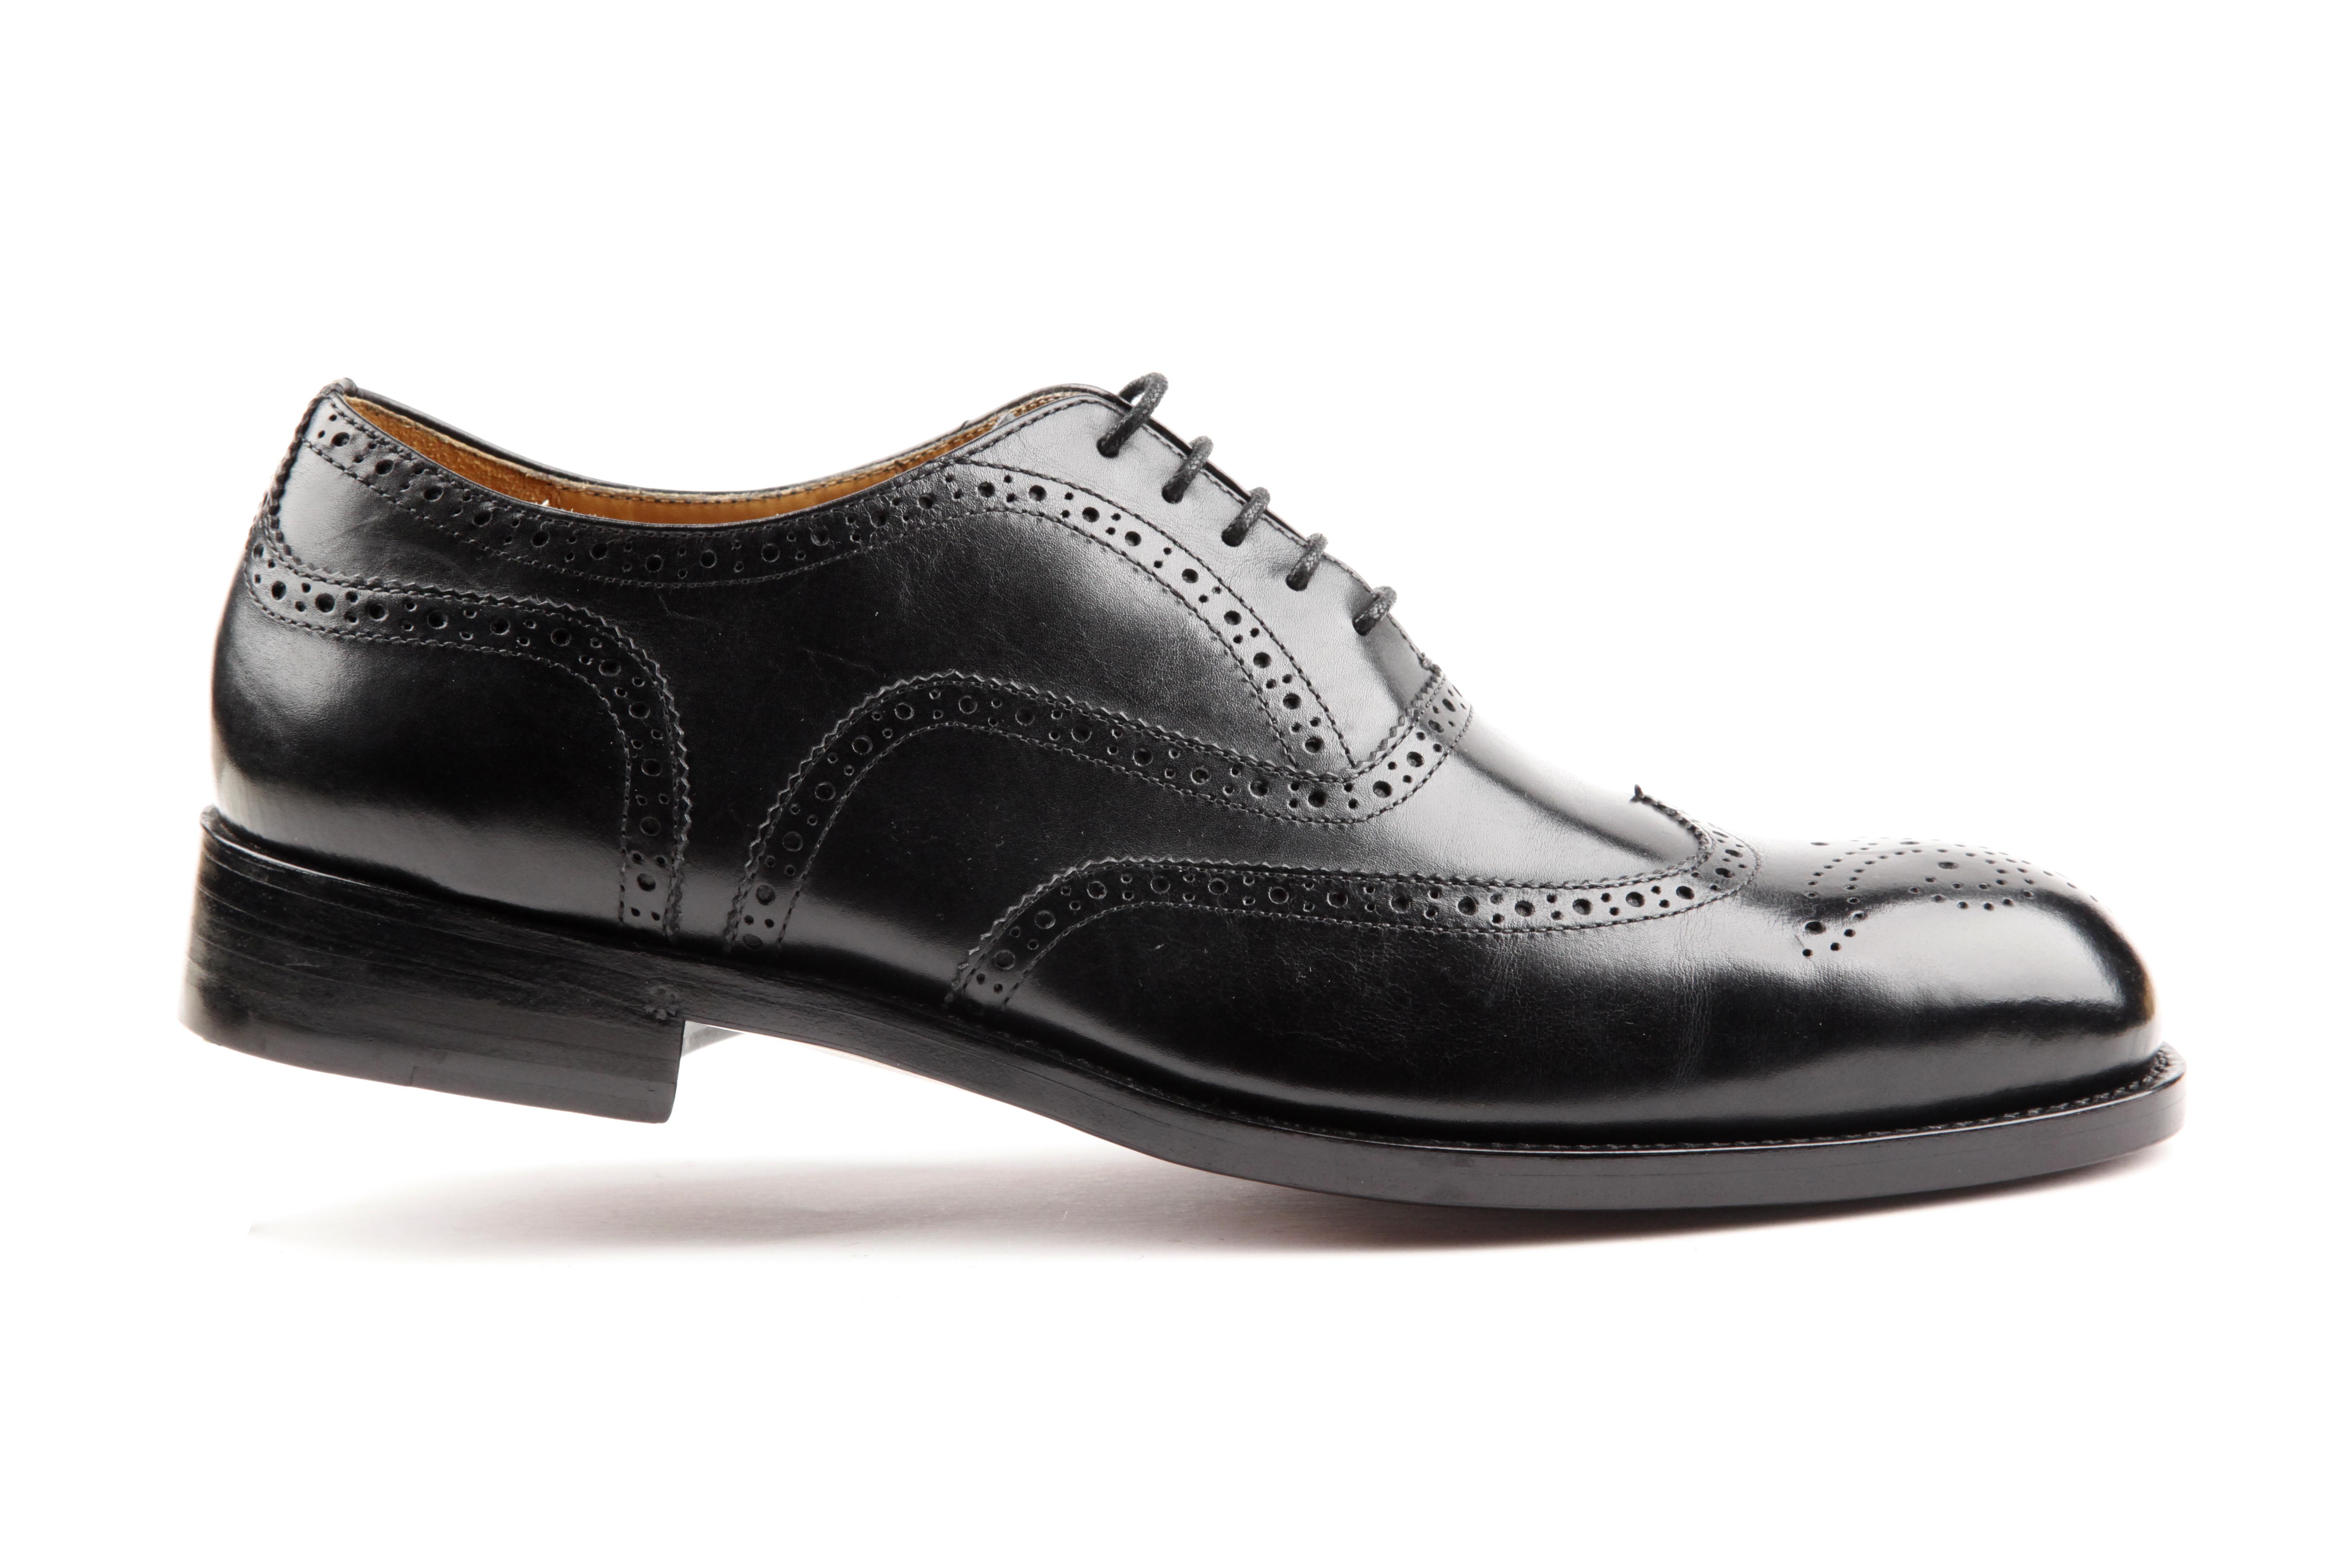 chaussure derby chaussuresurmesure. Black Bedroom Furniture Sets. Home Design Ideas